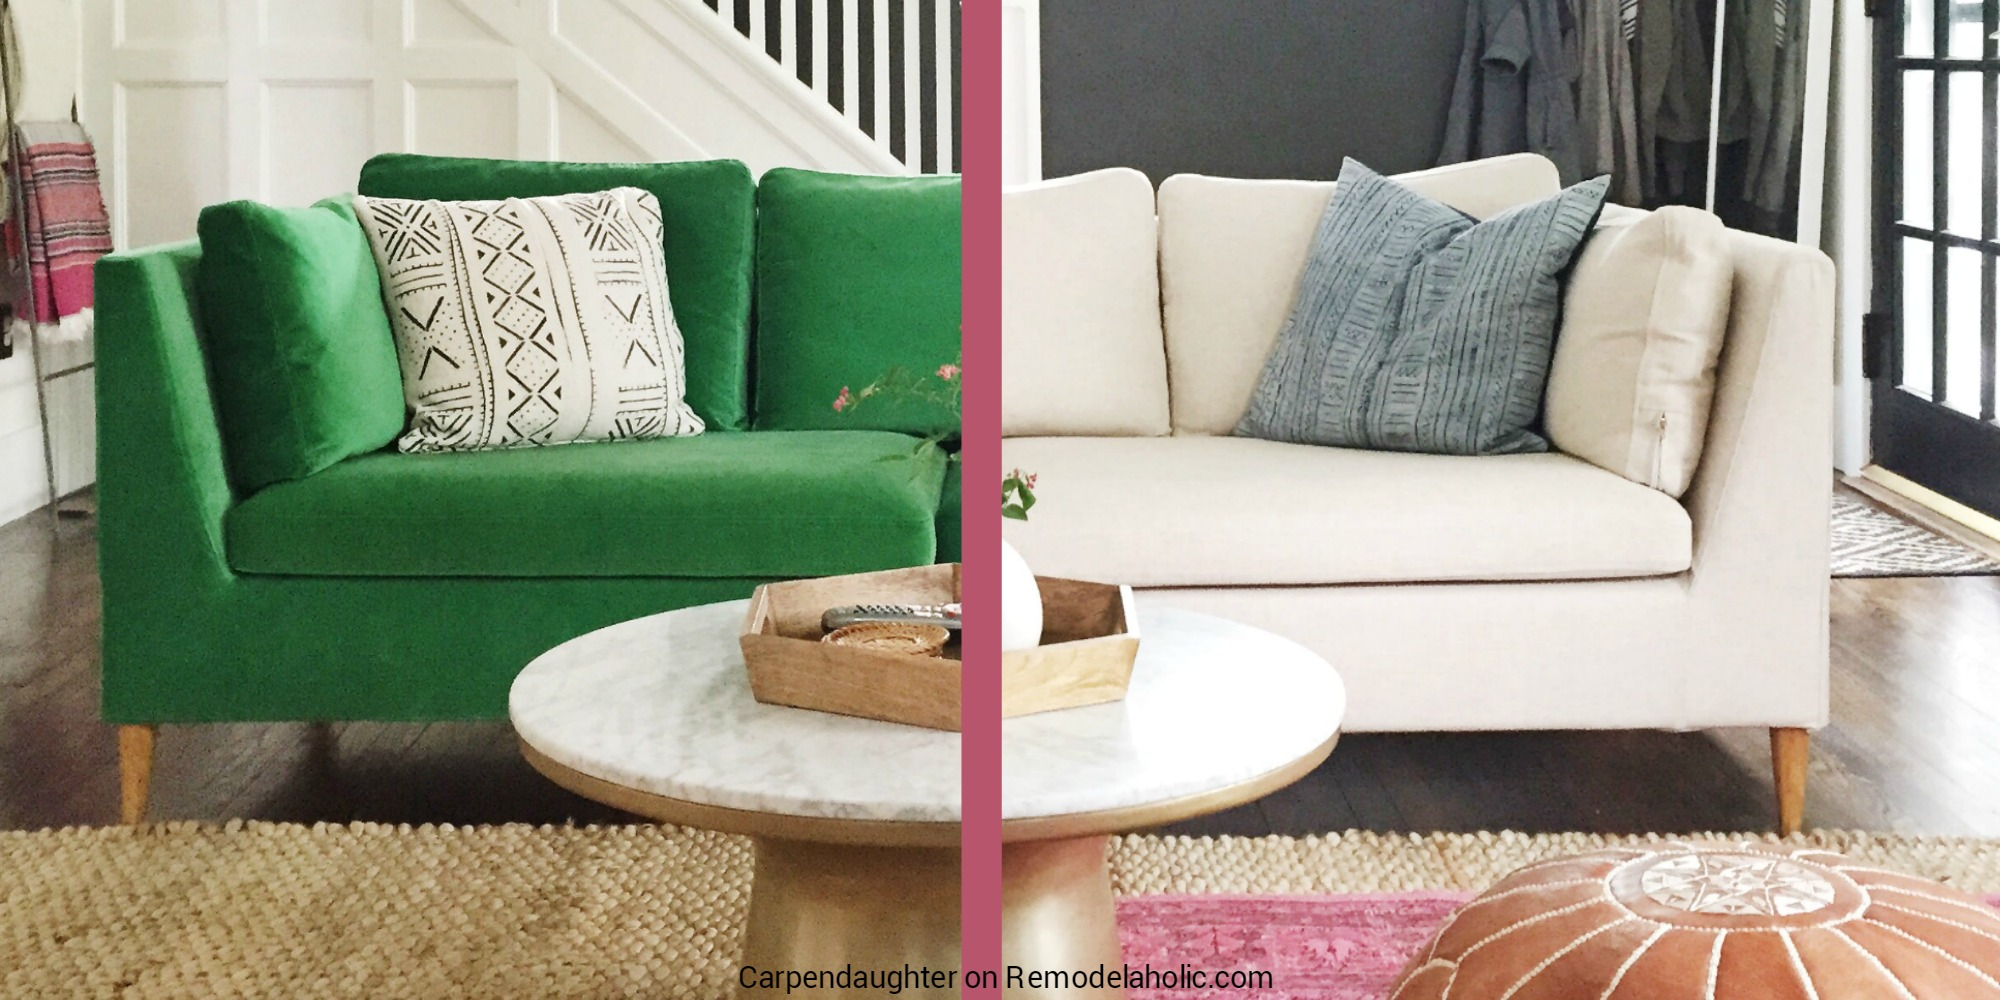 Remodelaholic | Easily Change a Room with a Custom IKEA Sofa ...